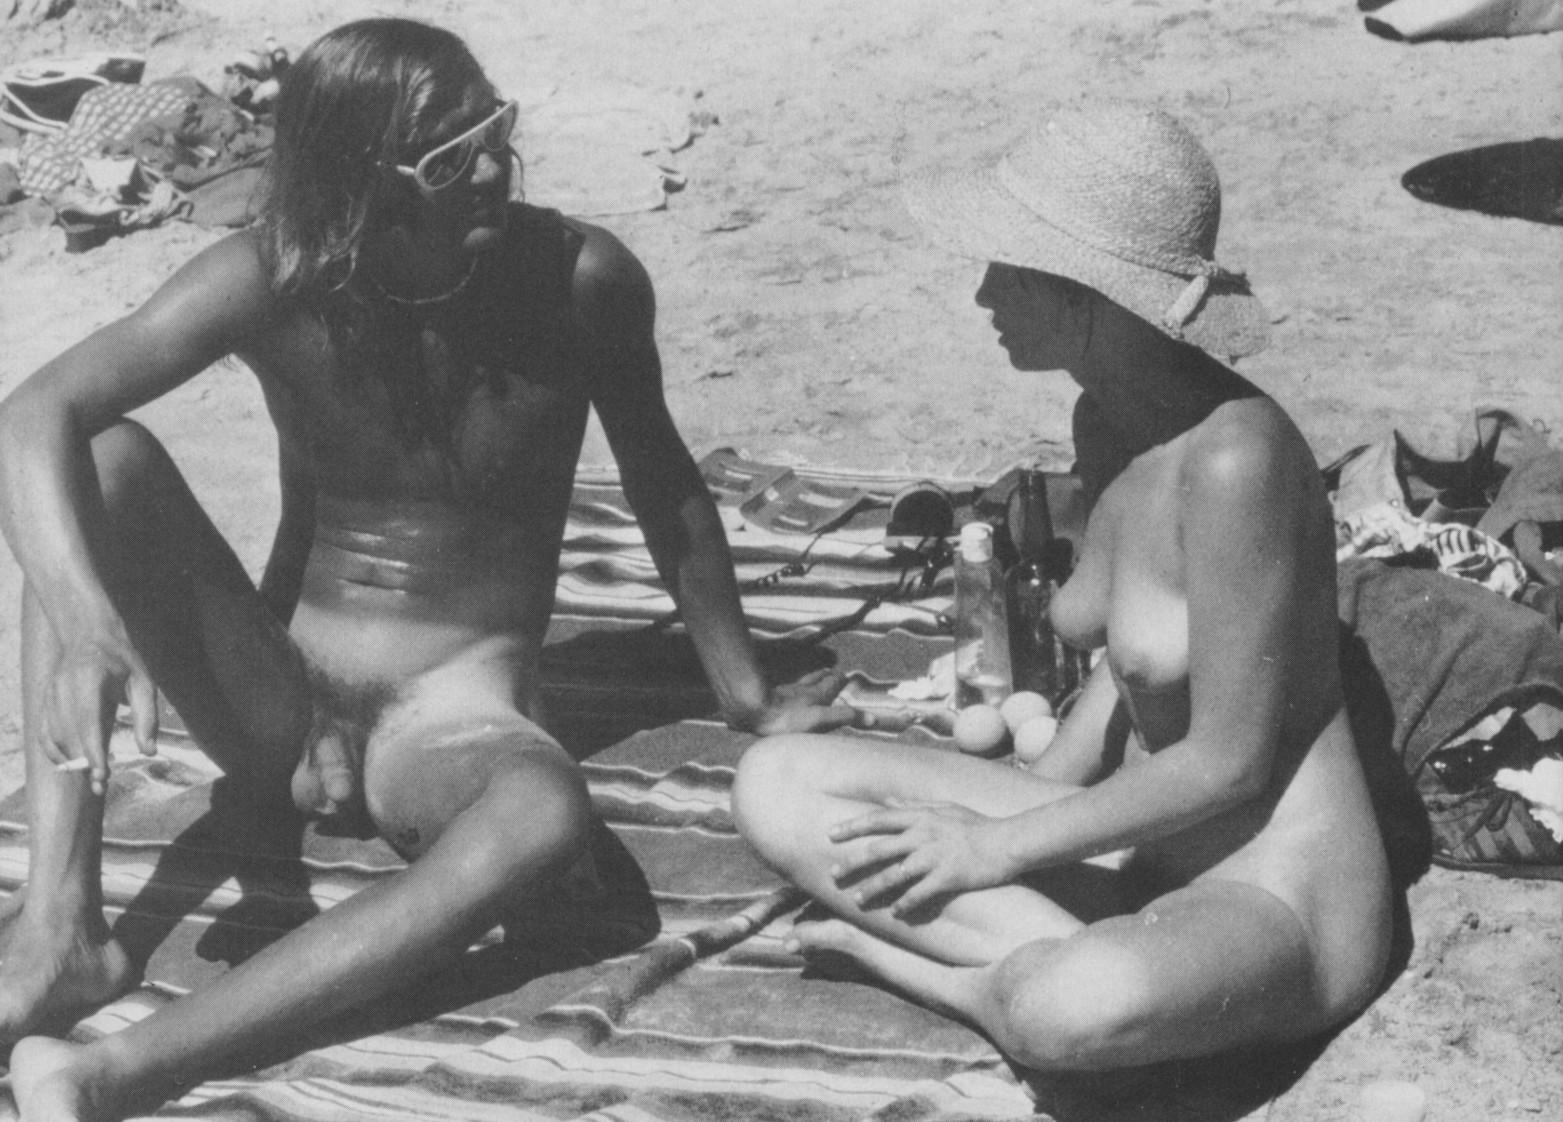 Mujeres peludas vintage mpegs